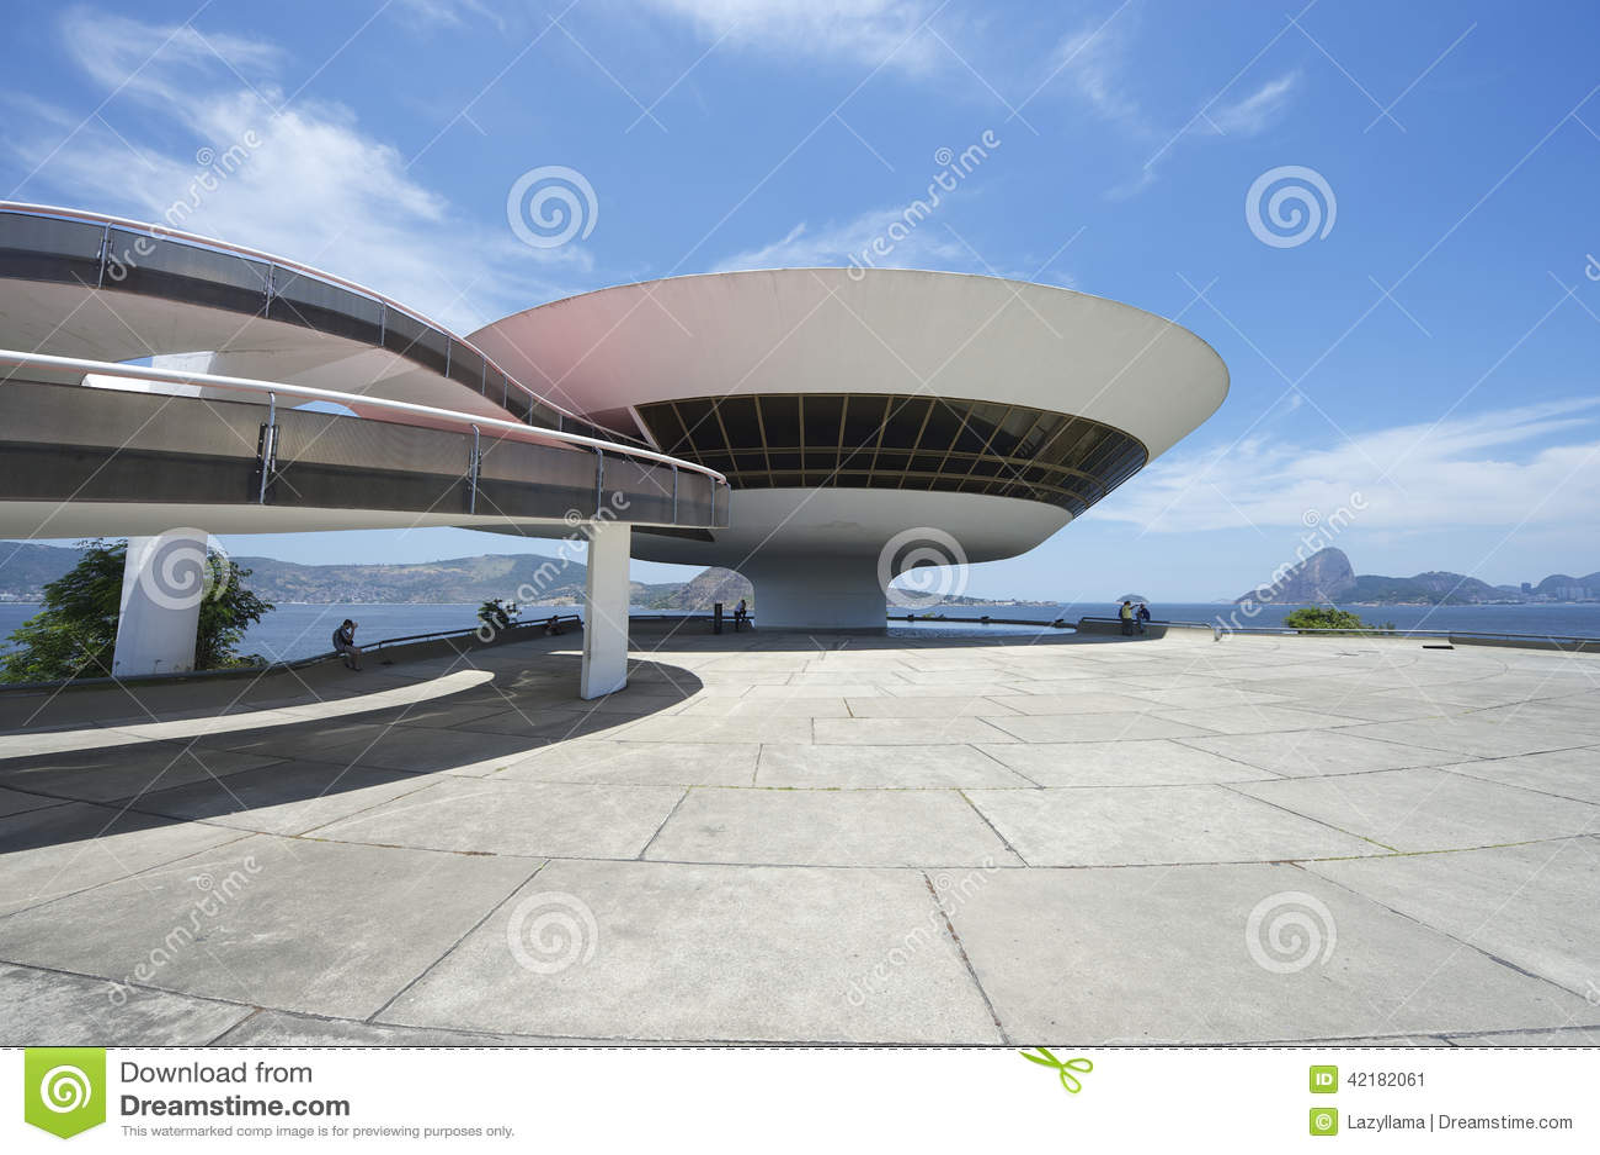 Niteroi Museum Rio de Janeiro Brazil Entrance